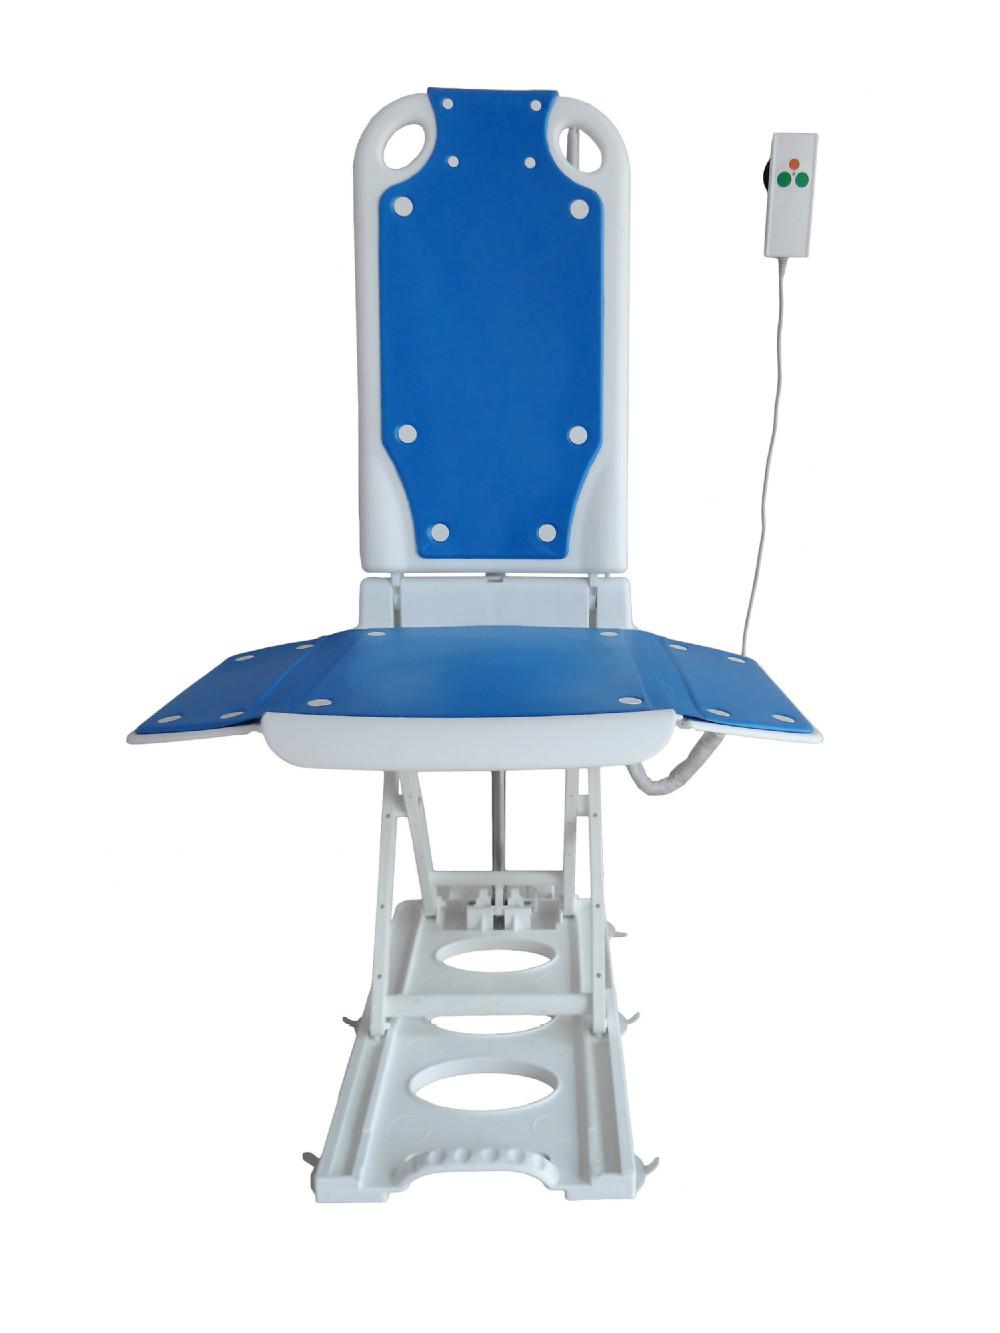 Bath Chair PNG HD | PNG Mart